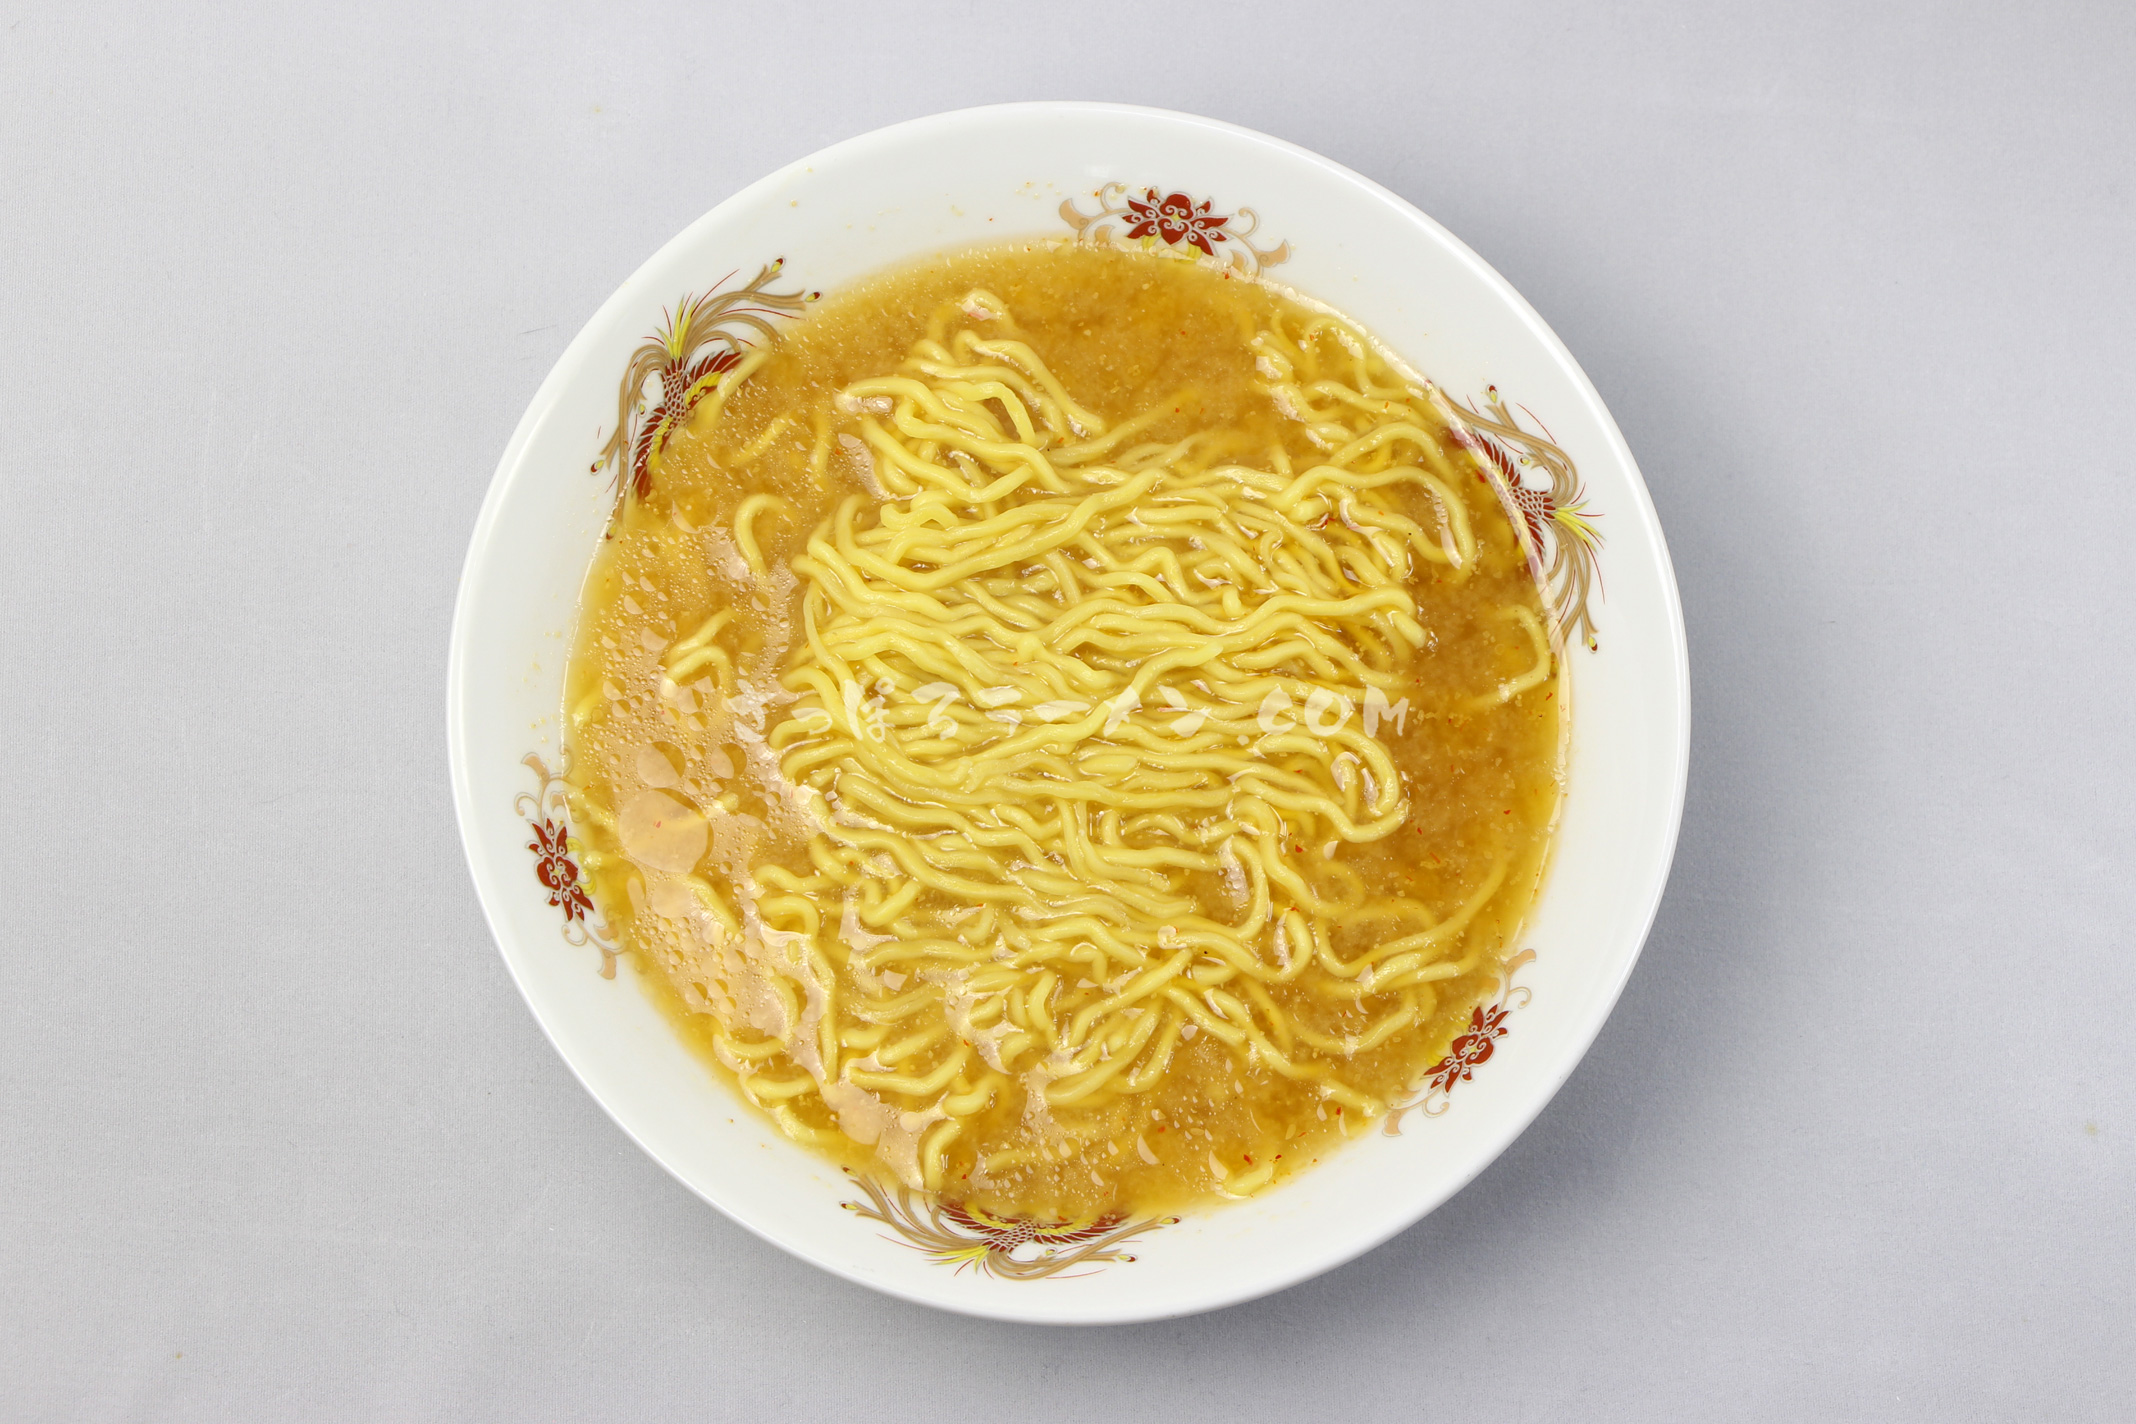 「B・B NOODLE みそ味」(西山製麺)の完成画像